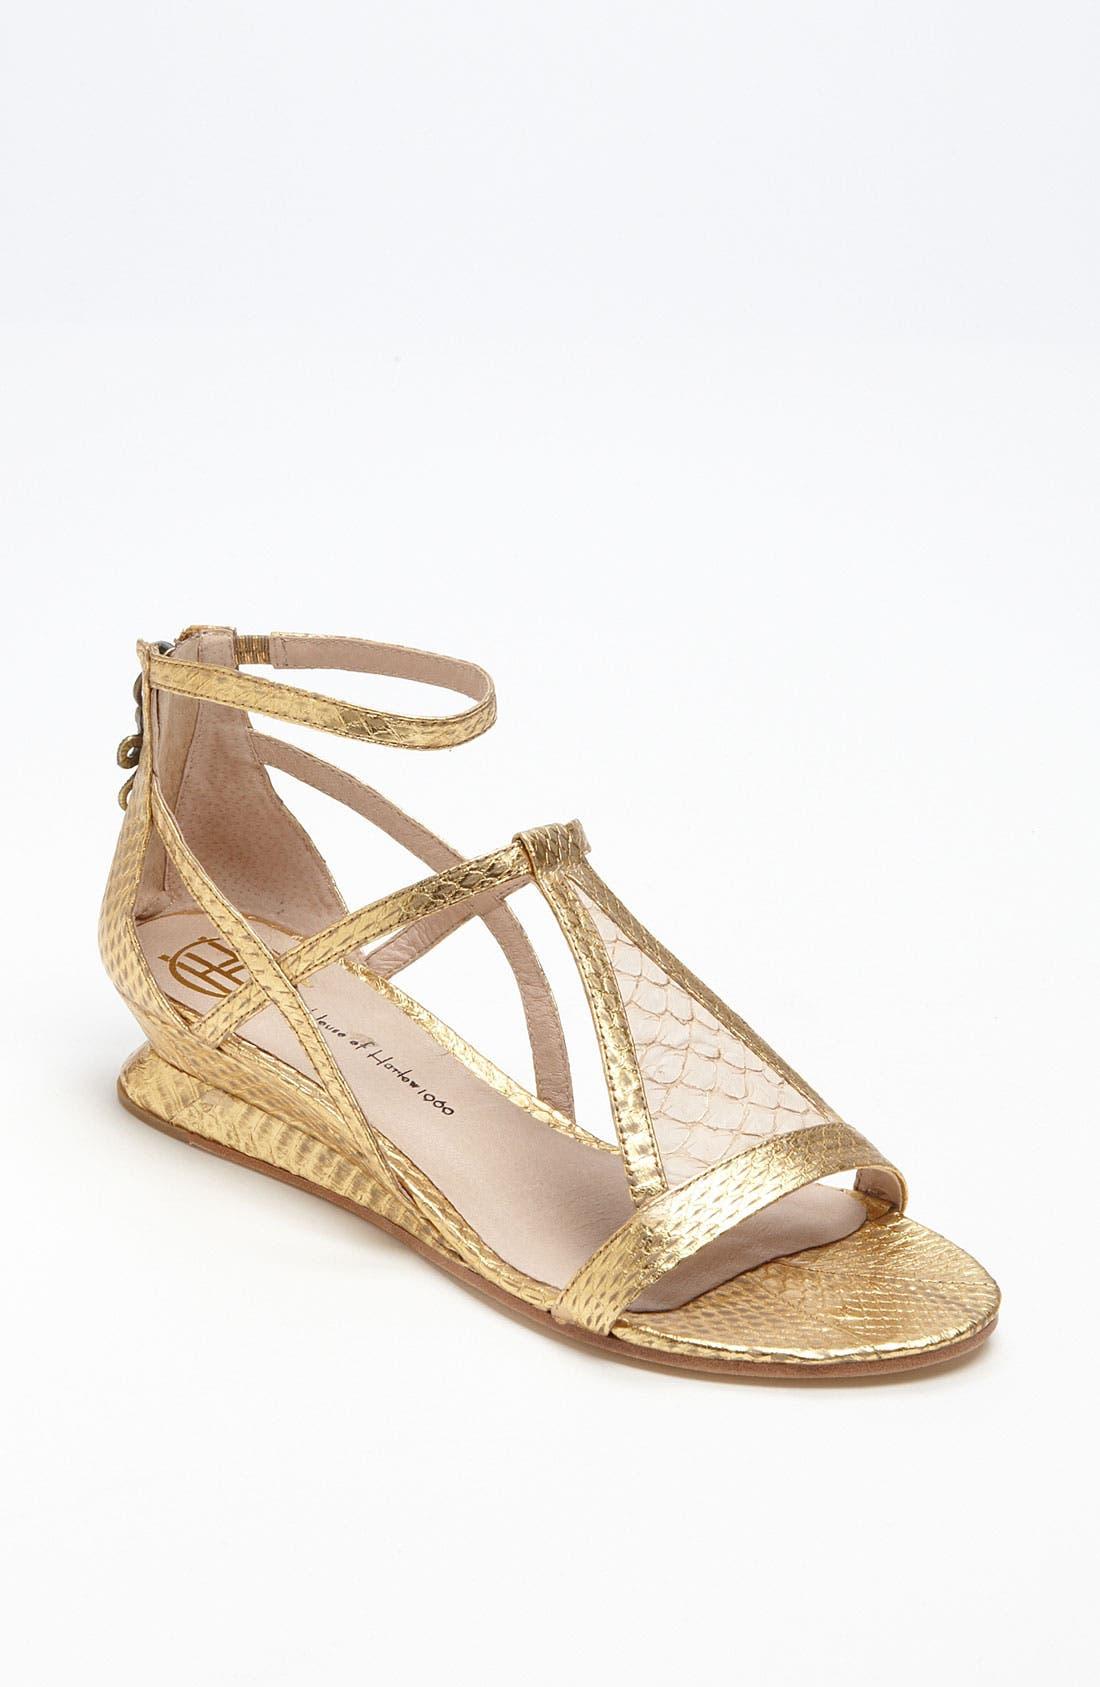 Alternate Image 1 Selected - House of Harlow 1960 'Casmine' Sandal